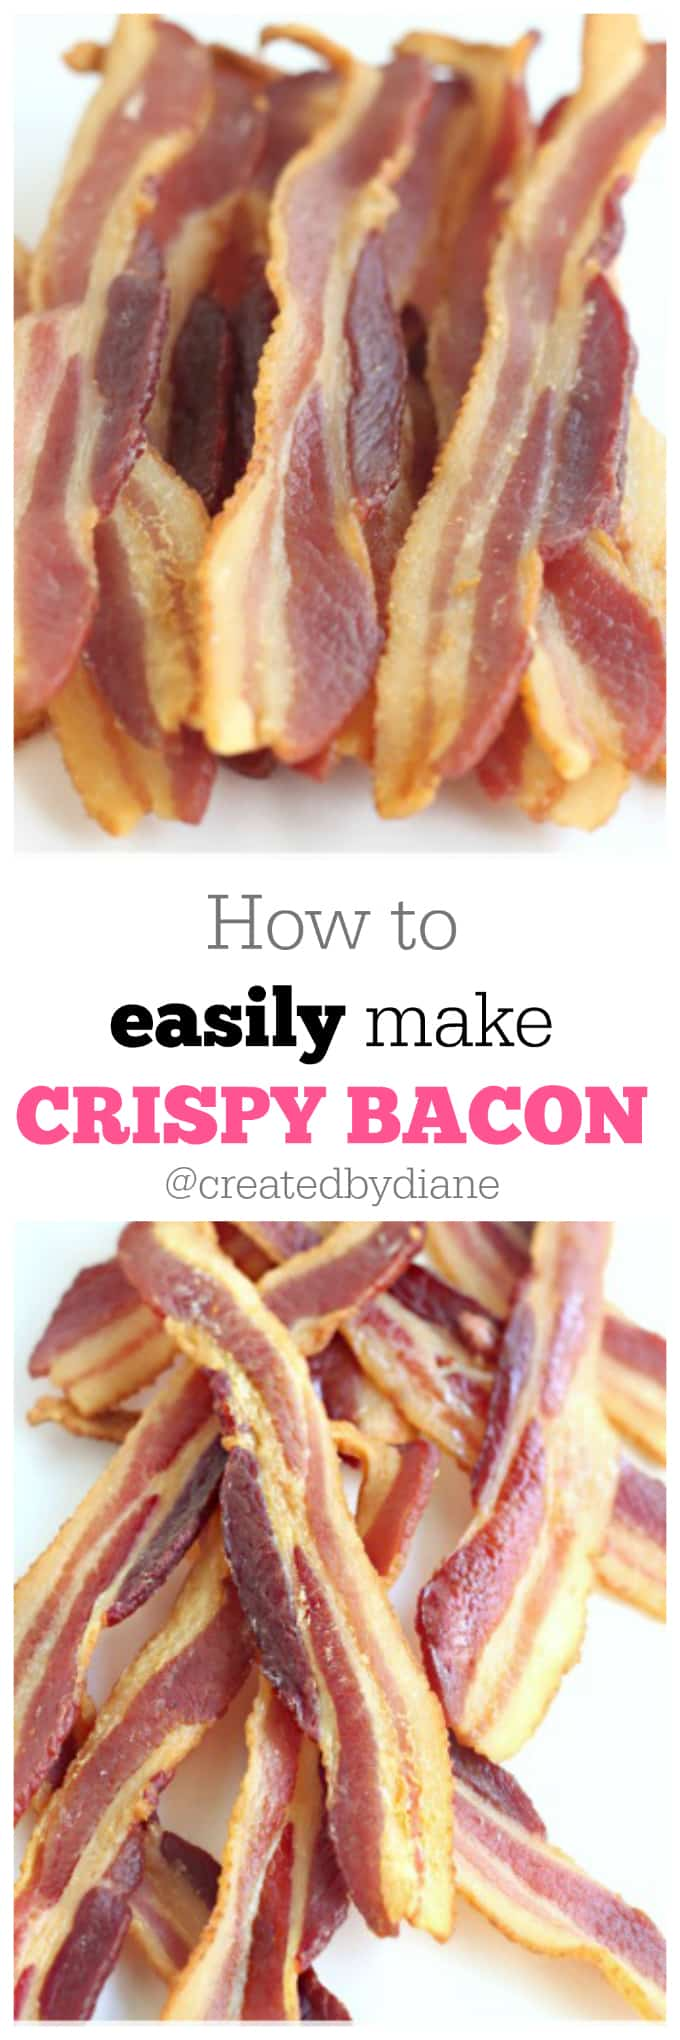 how to easily make crispy bacon